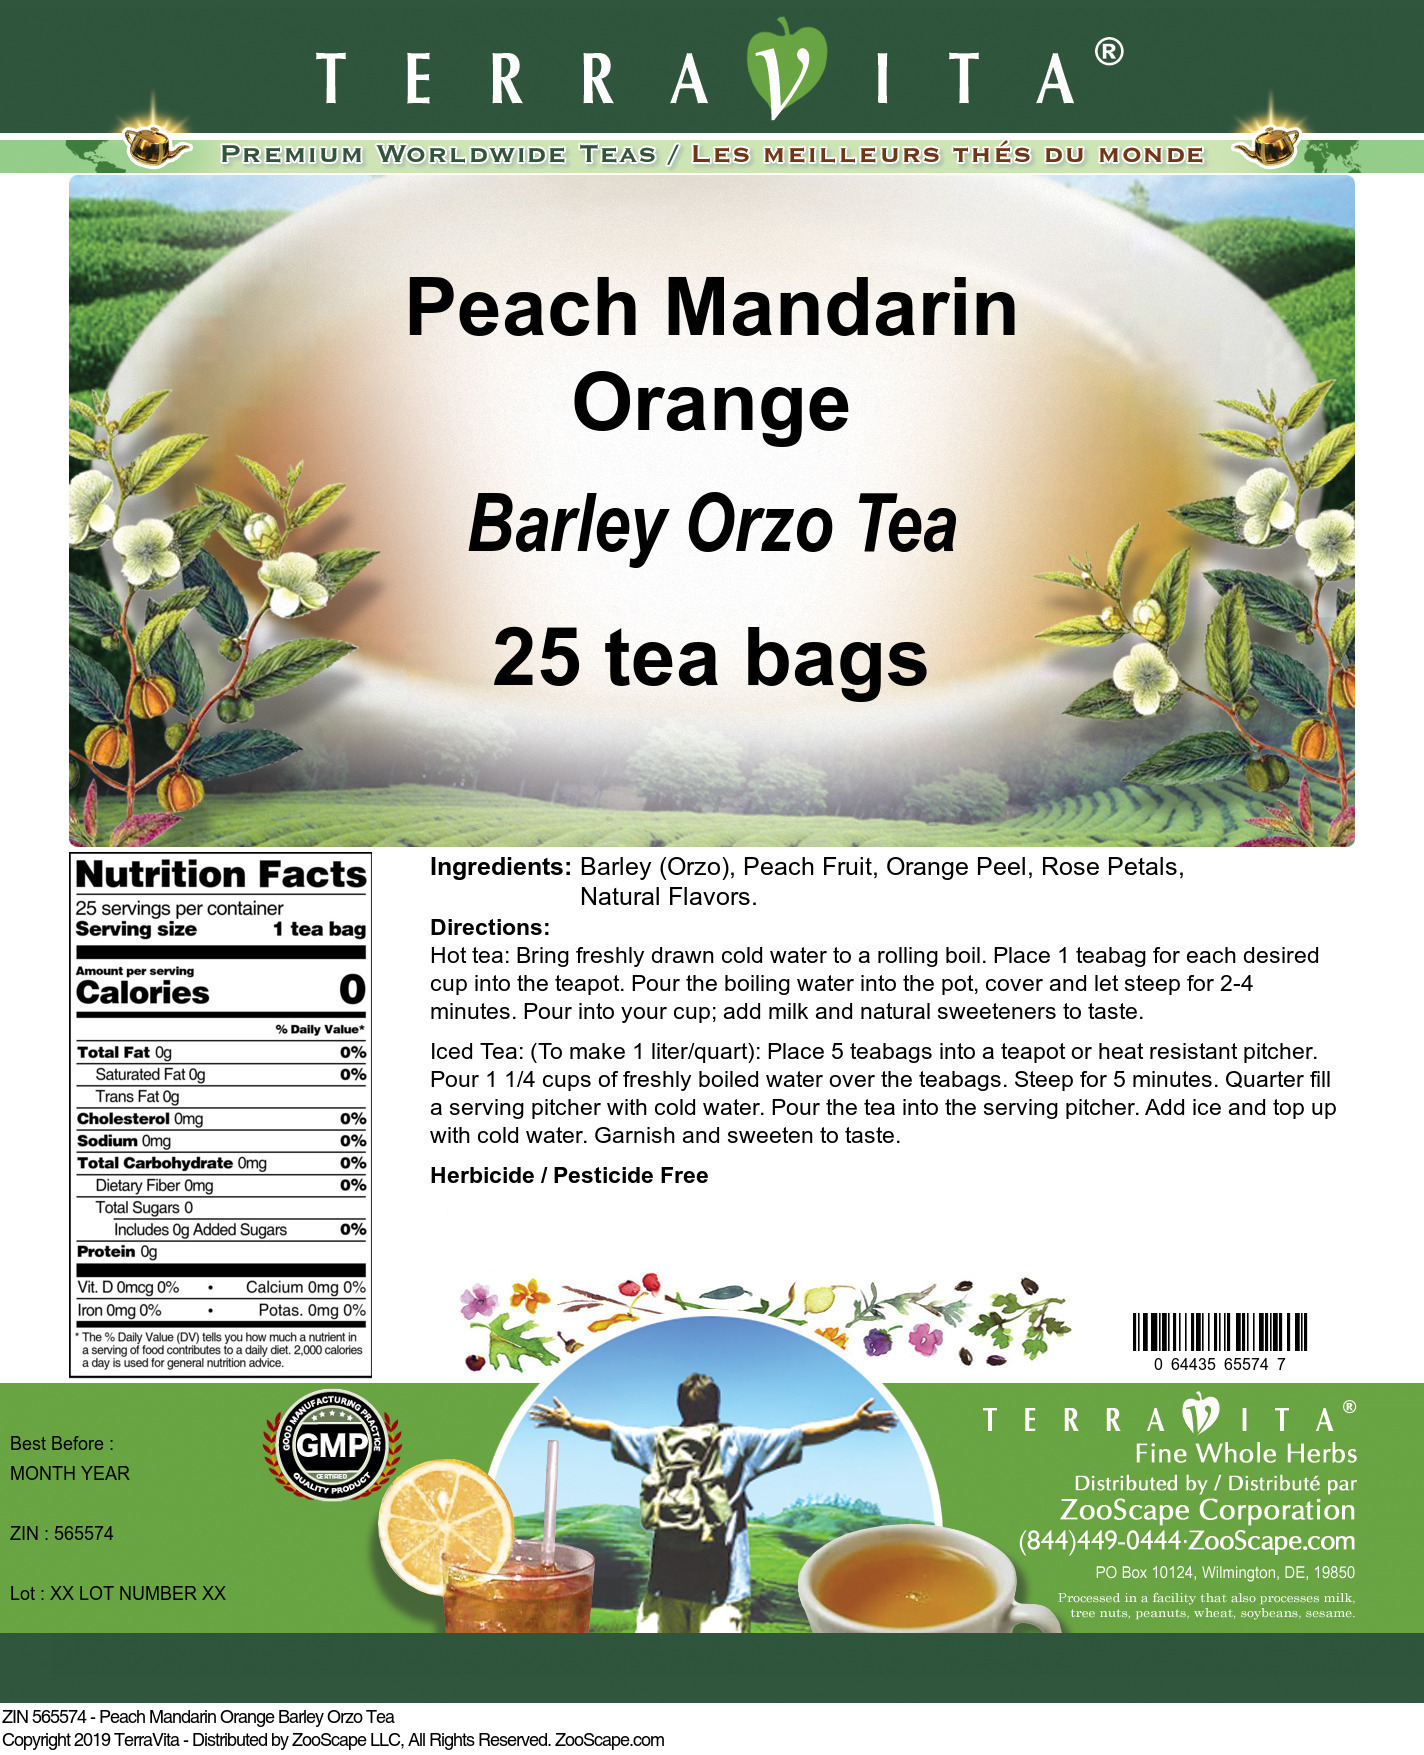 Peach Mandarin Orange Barley Orzo Tea